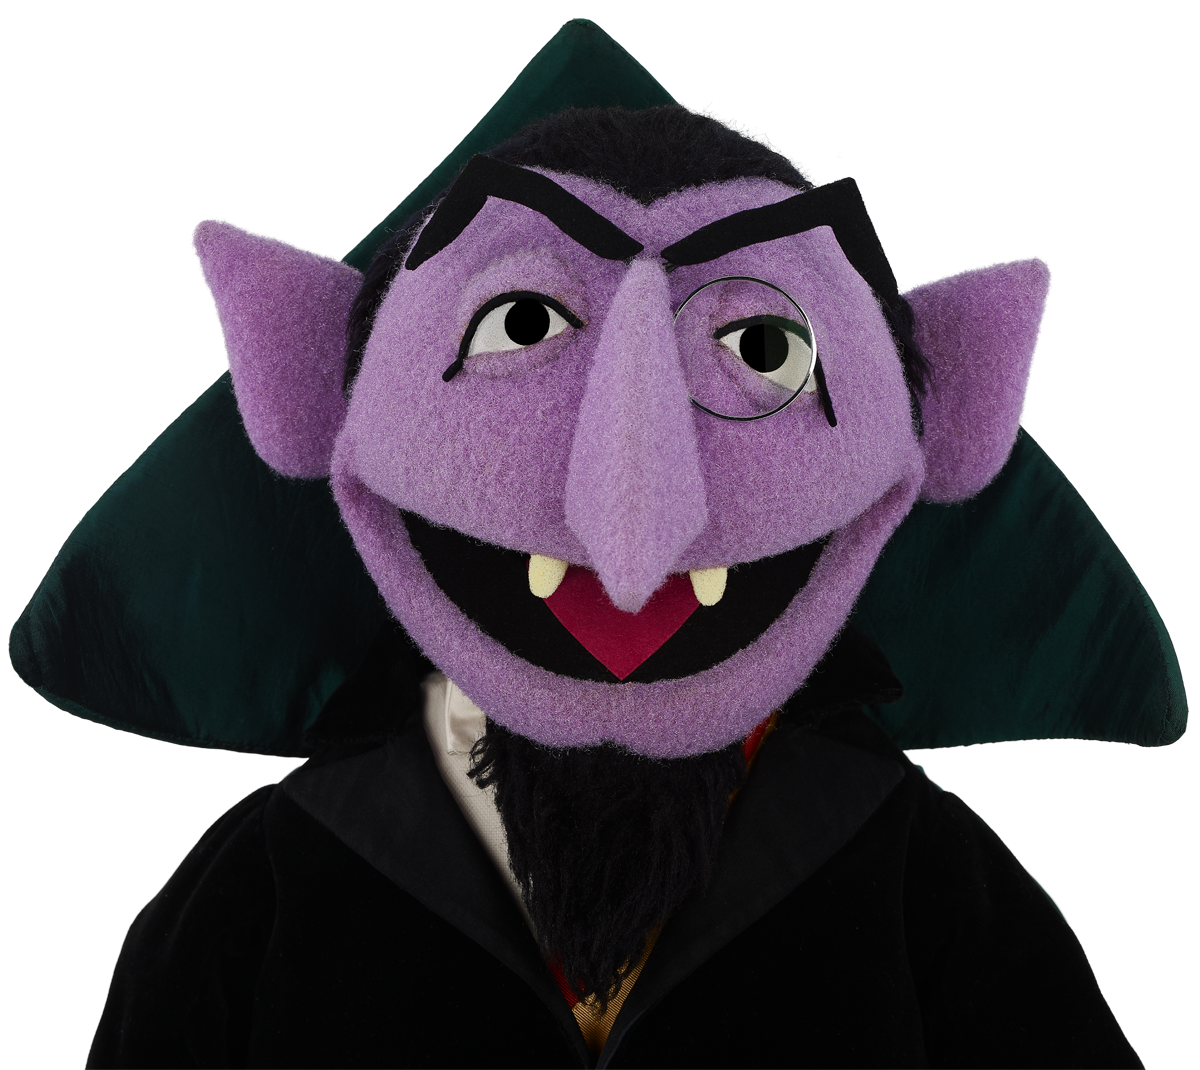 Sesame Street clipart count dracula Of images com europe Dracula